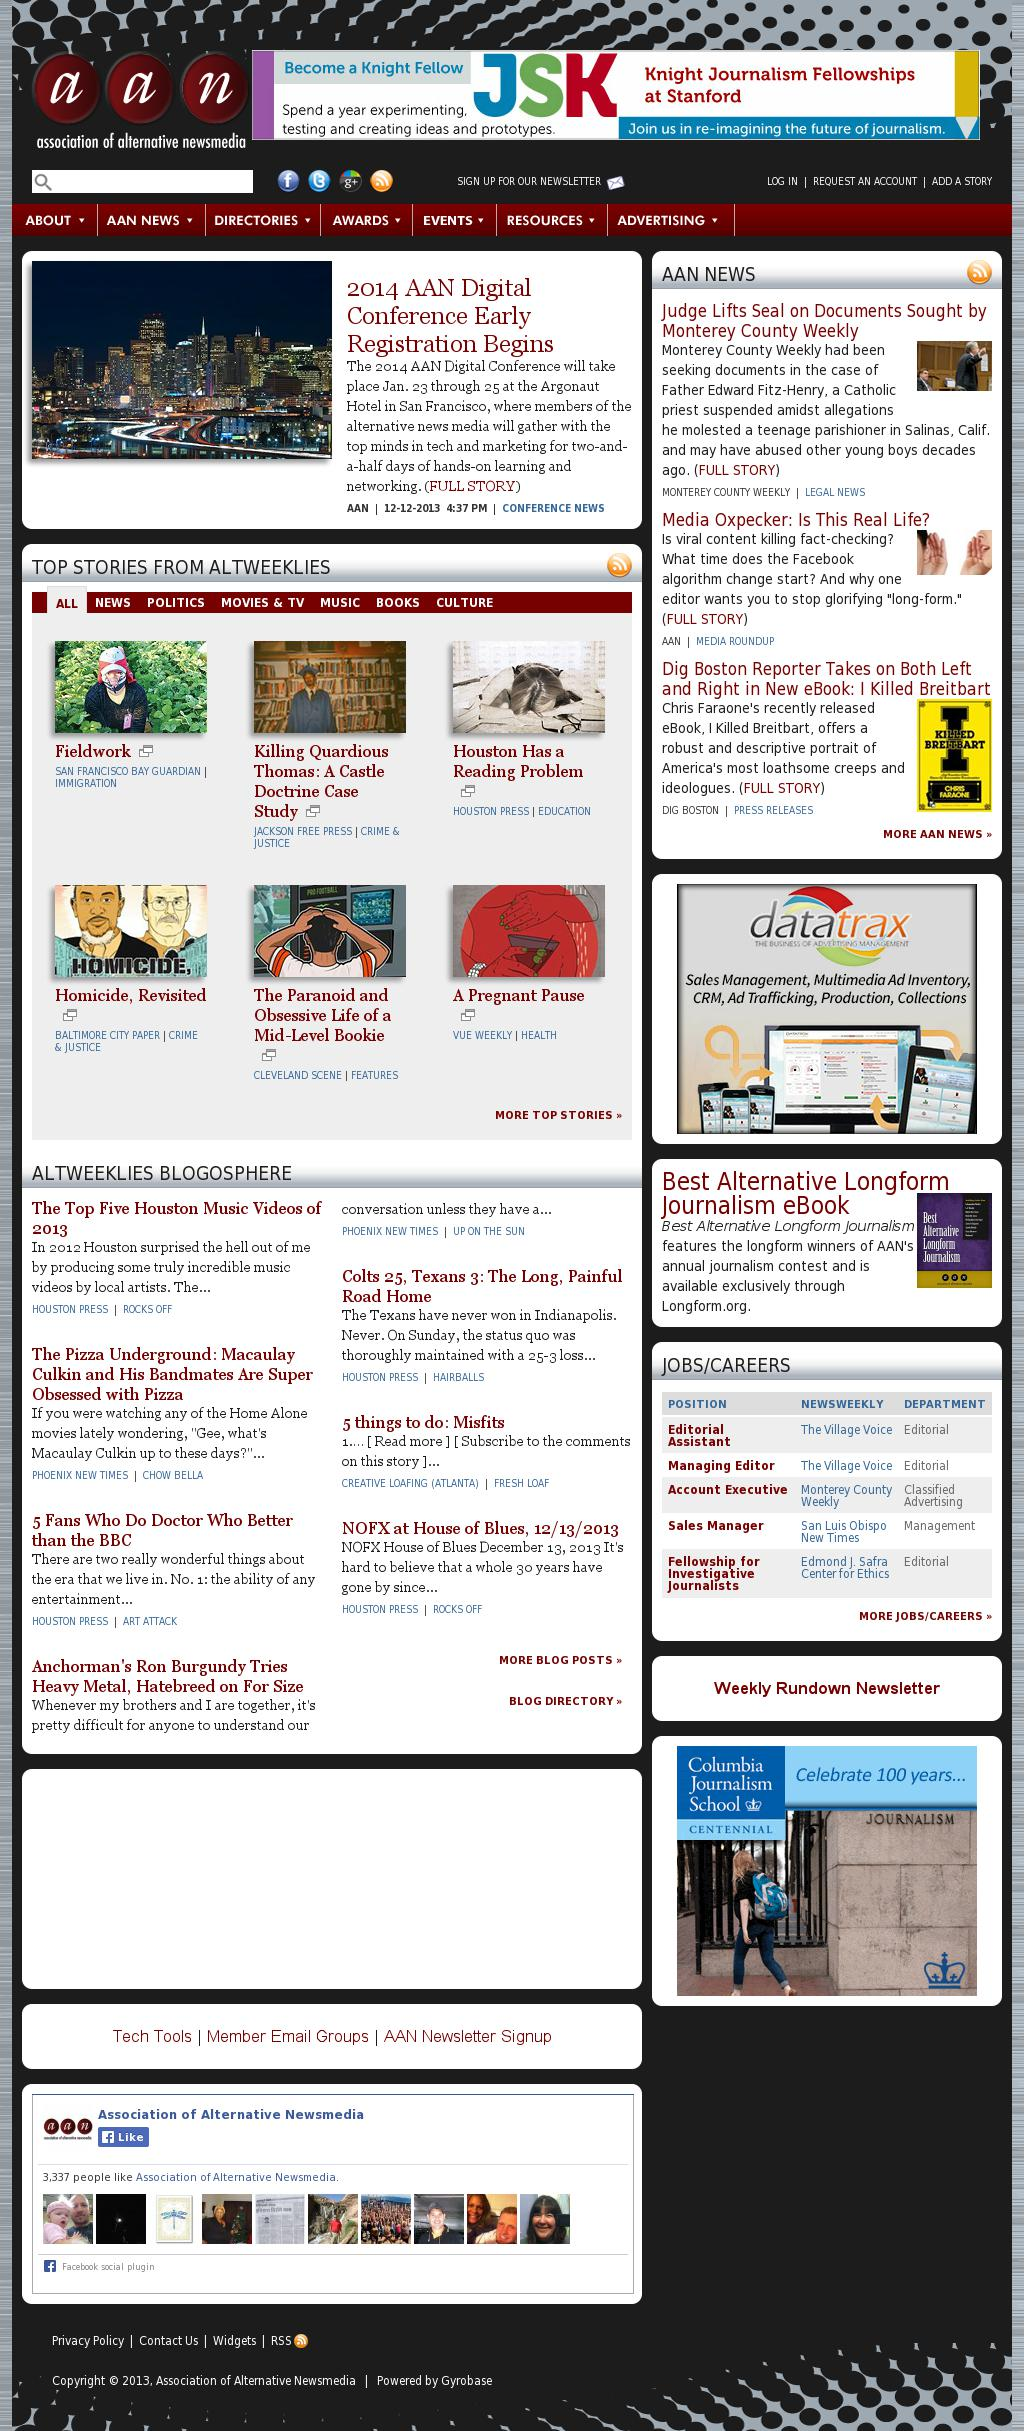 Association of Alternative Newsmedia at Monday Dec. 16, 2013, 5 p.m. UTC